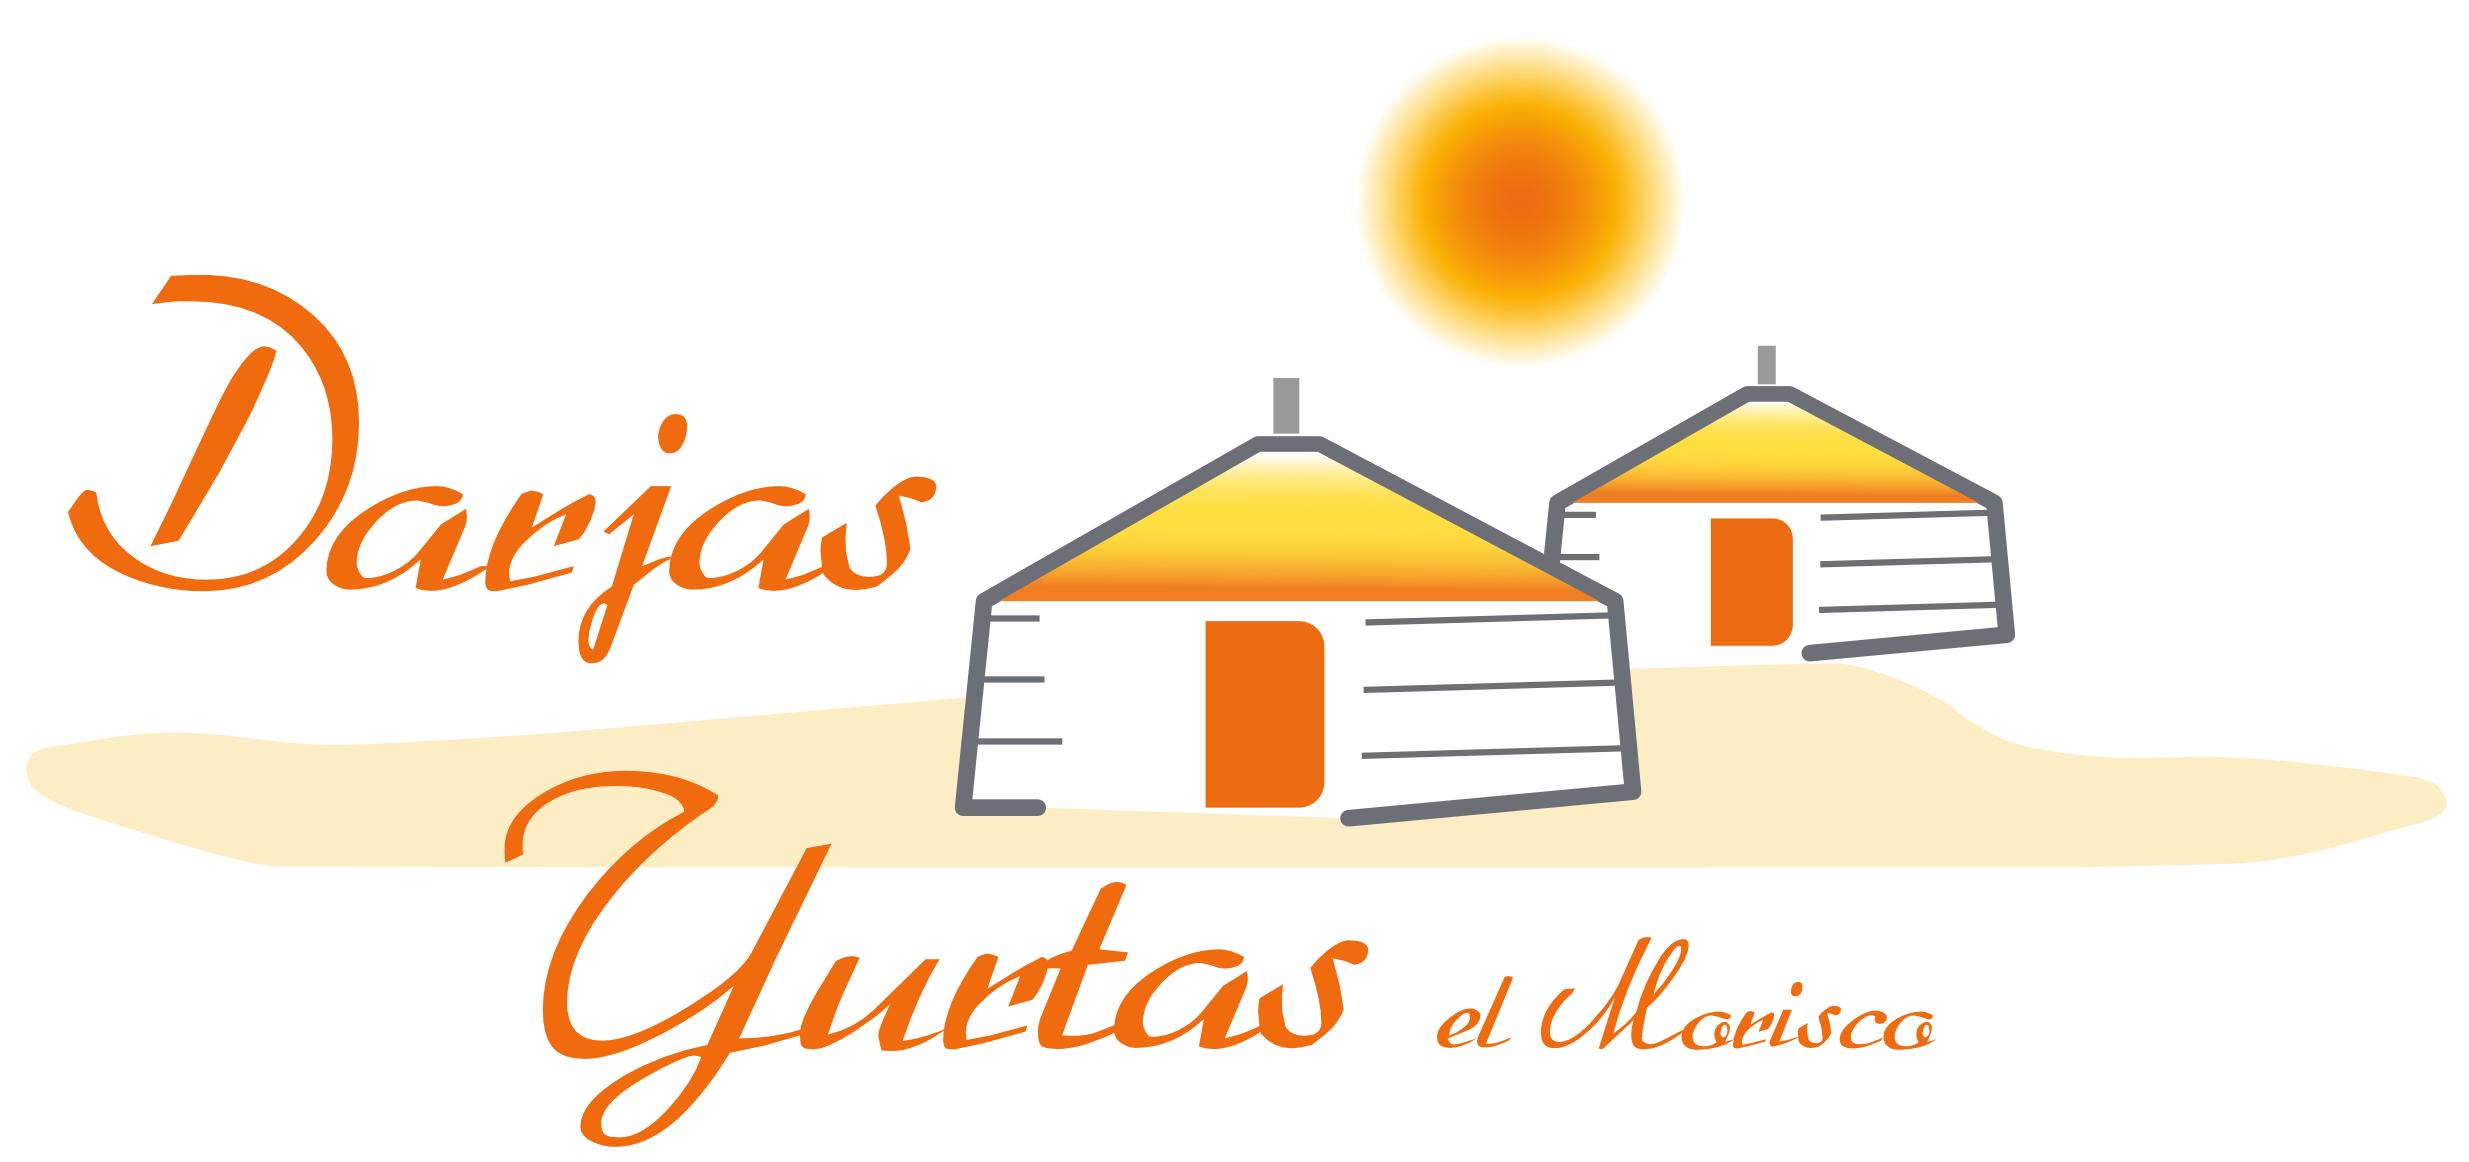 Darjas Yurtas Logo V2.png